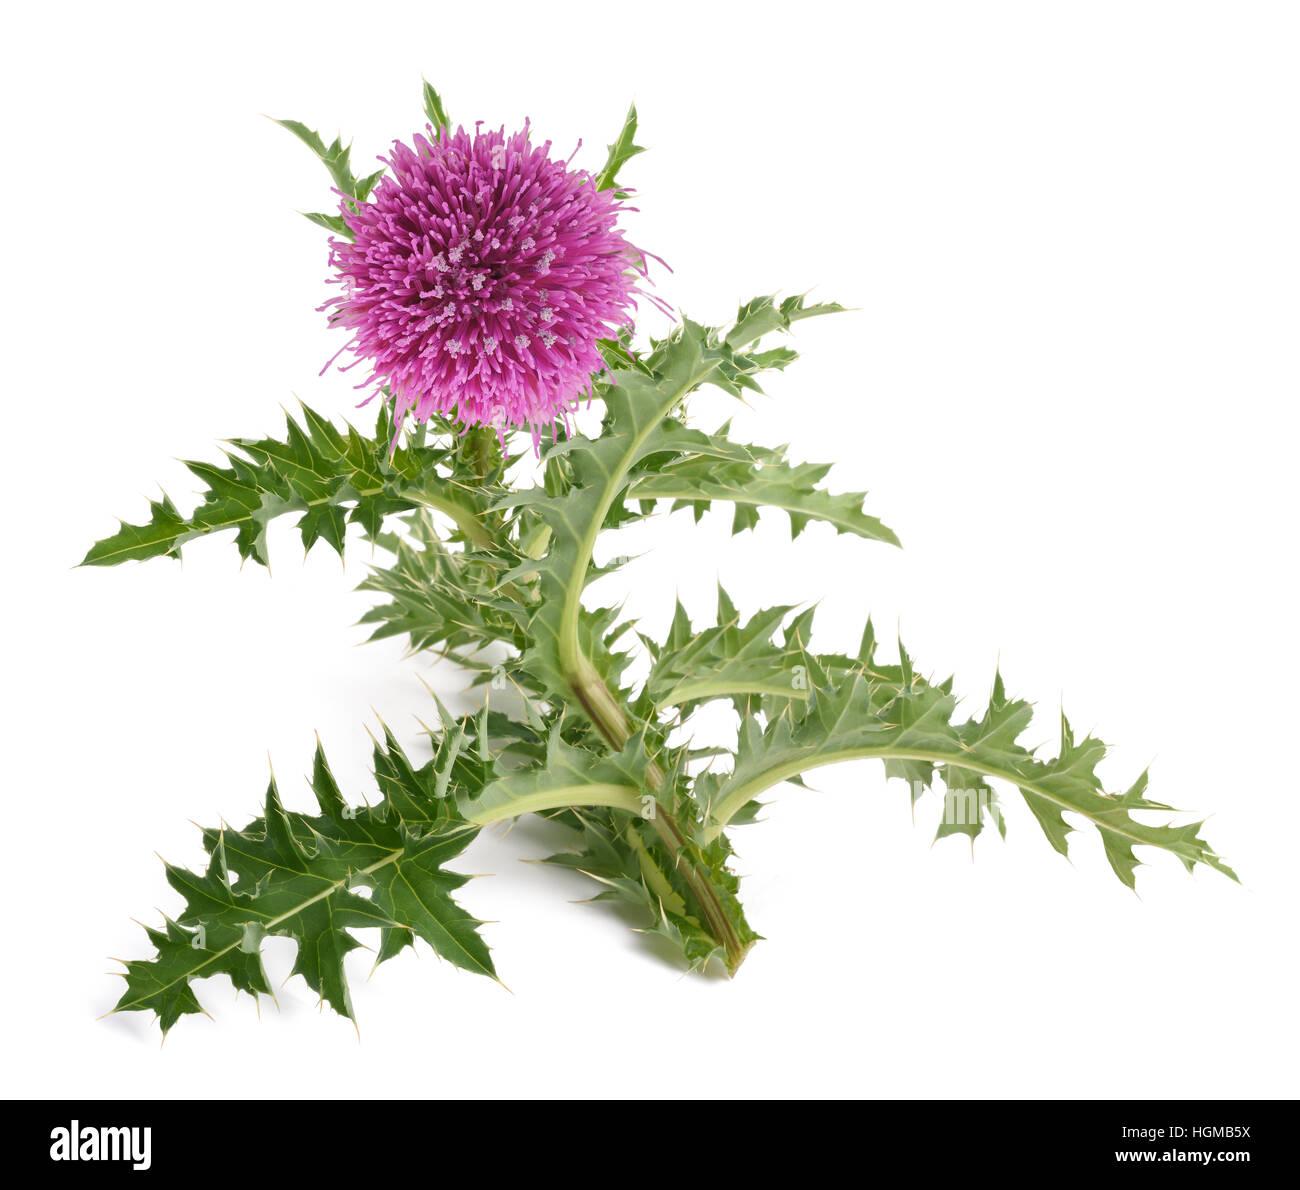 thistle flower isolated on white background - Stock Image